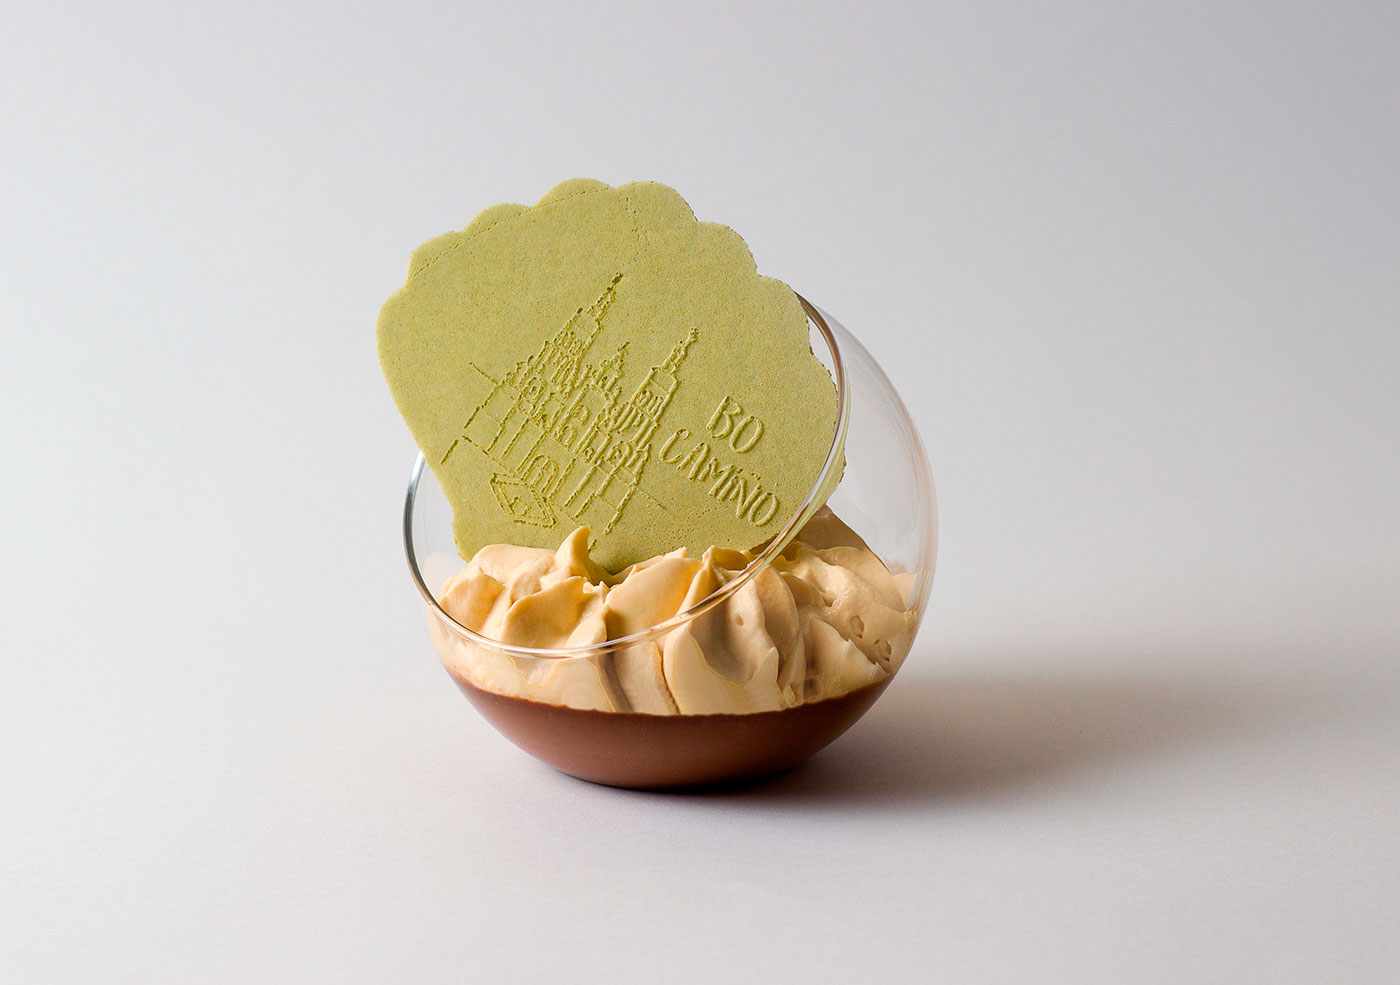 ElFotogastro-Xacobleas-crema-de-chocolate